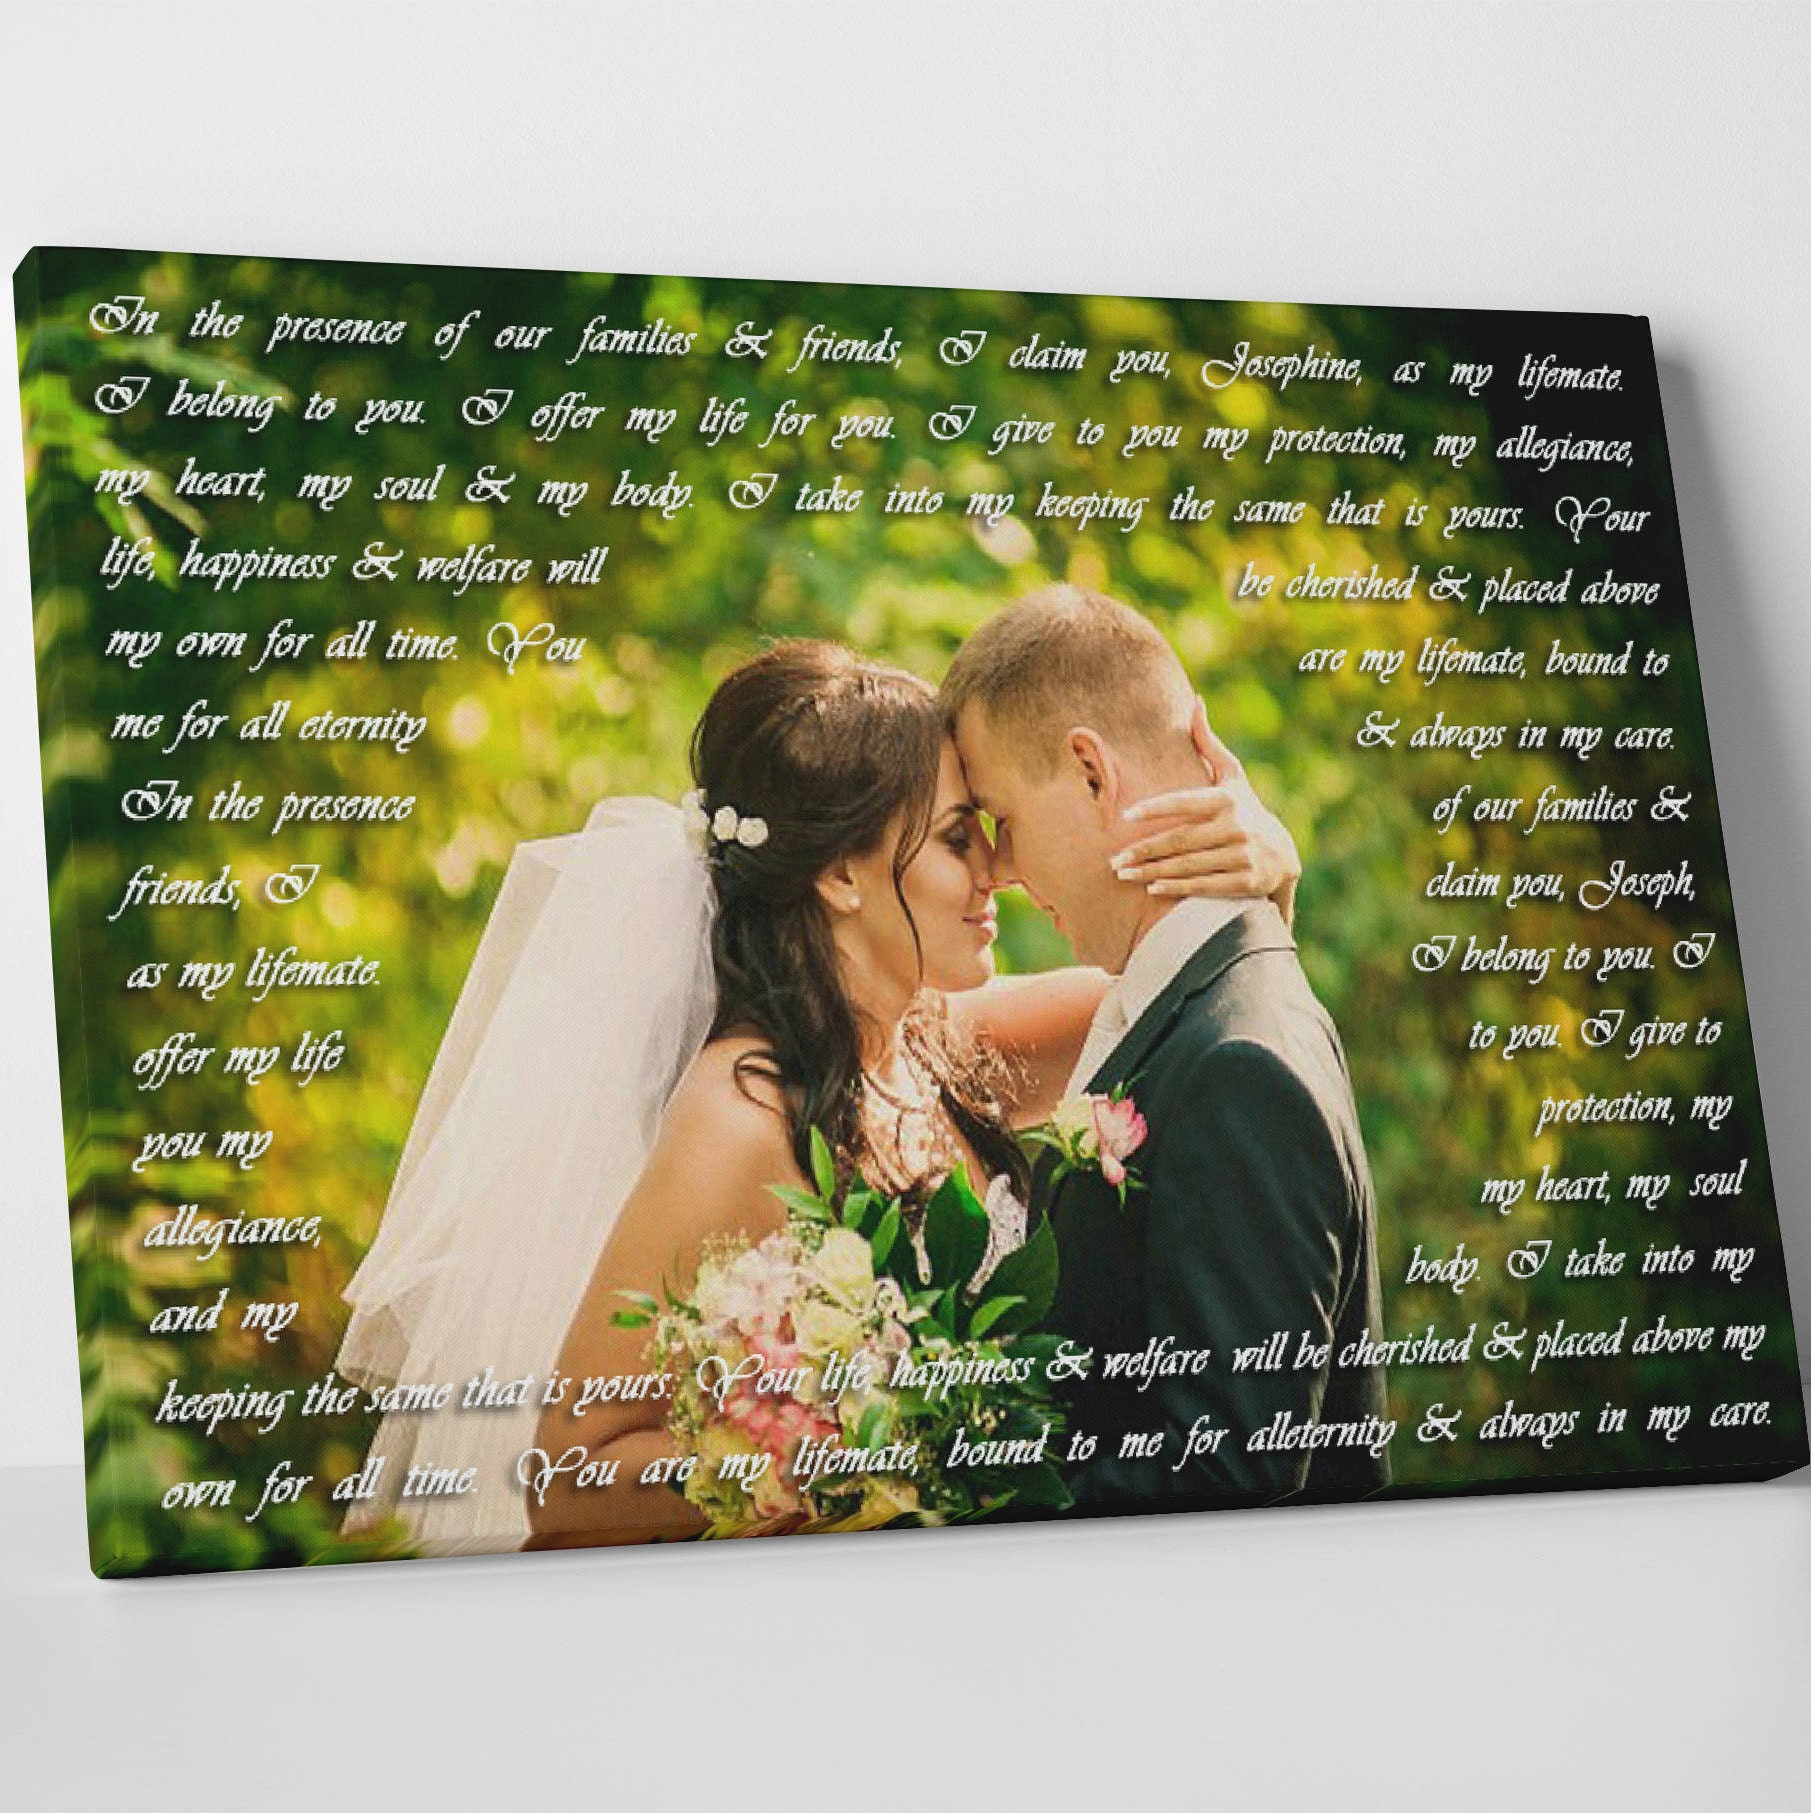 Etsy Wedding Gift Ideas: 9 Years Wedding Anniversary Gift Ideas 9th Anniversary